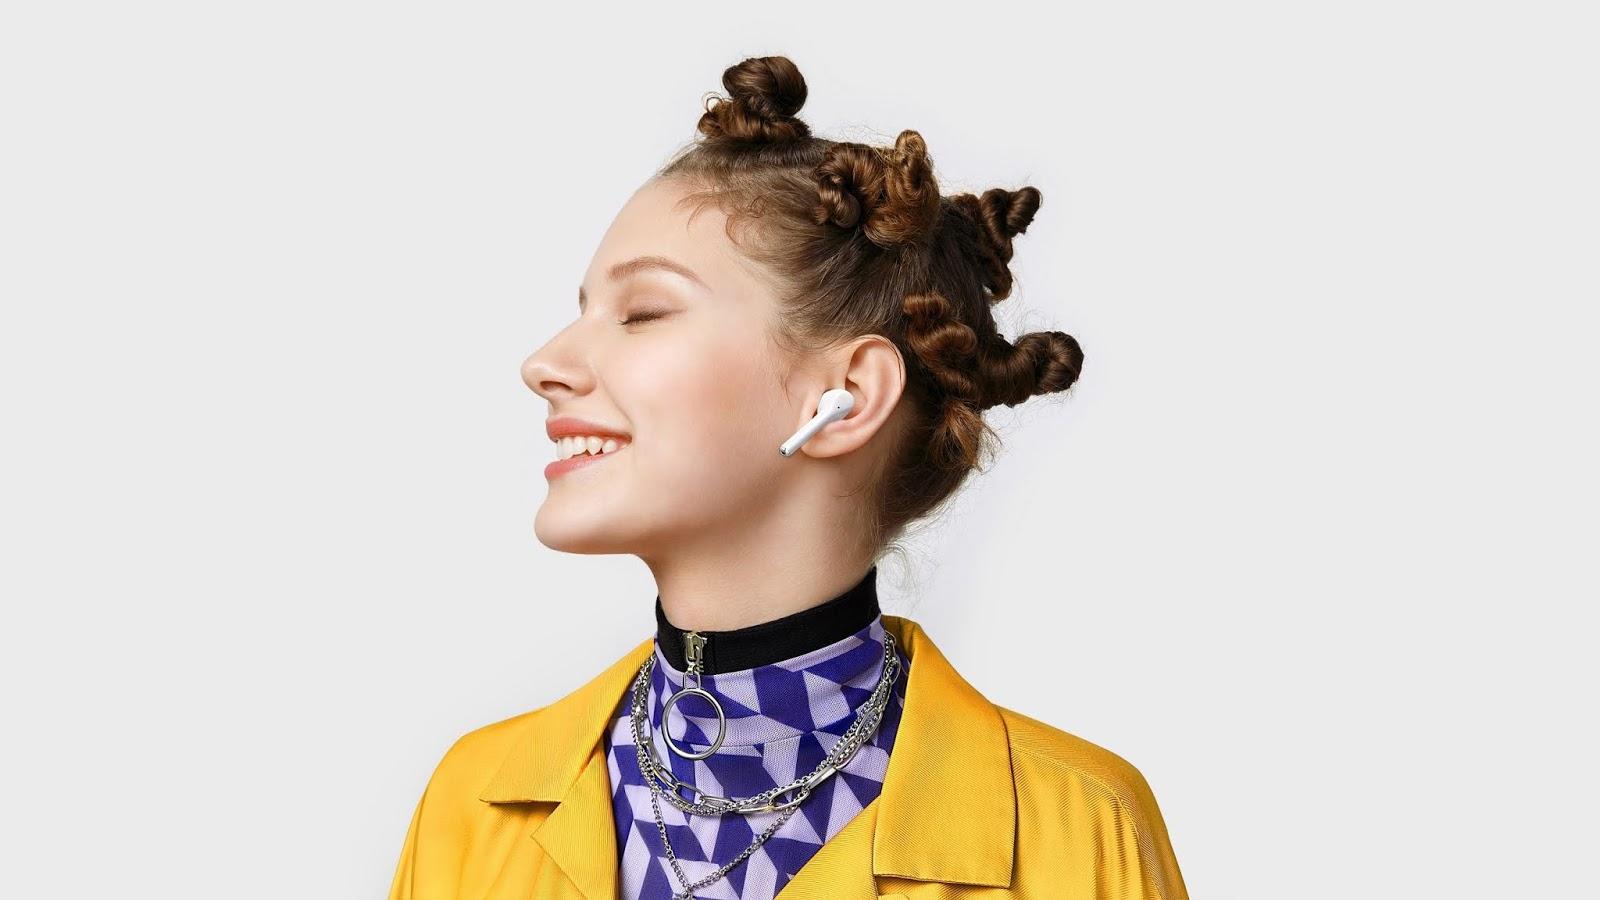 Huawei เปิดตัวหูฟัง HUAWEI FreeBuds 3i หูฟังตัดเสียงรบกวนแบบ In-Ear เติมเต็มสุนทรียแห่งเสียงรับของสมนาคุณพิเศษช่วงพรีออเดอร์ระหว่างวันที่ 10-21 มิ.ย. นี้เท่านั้น!